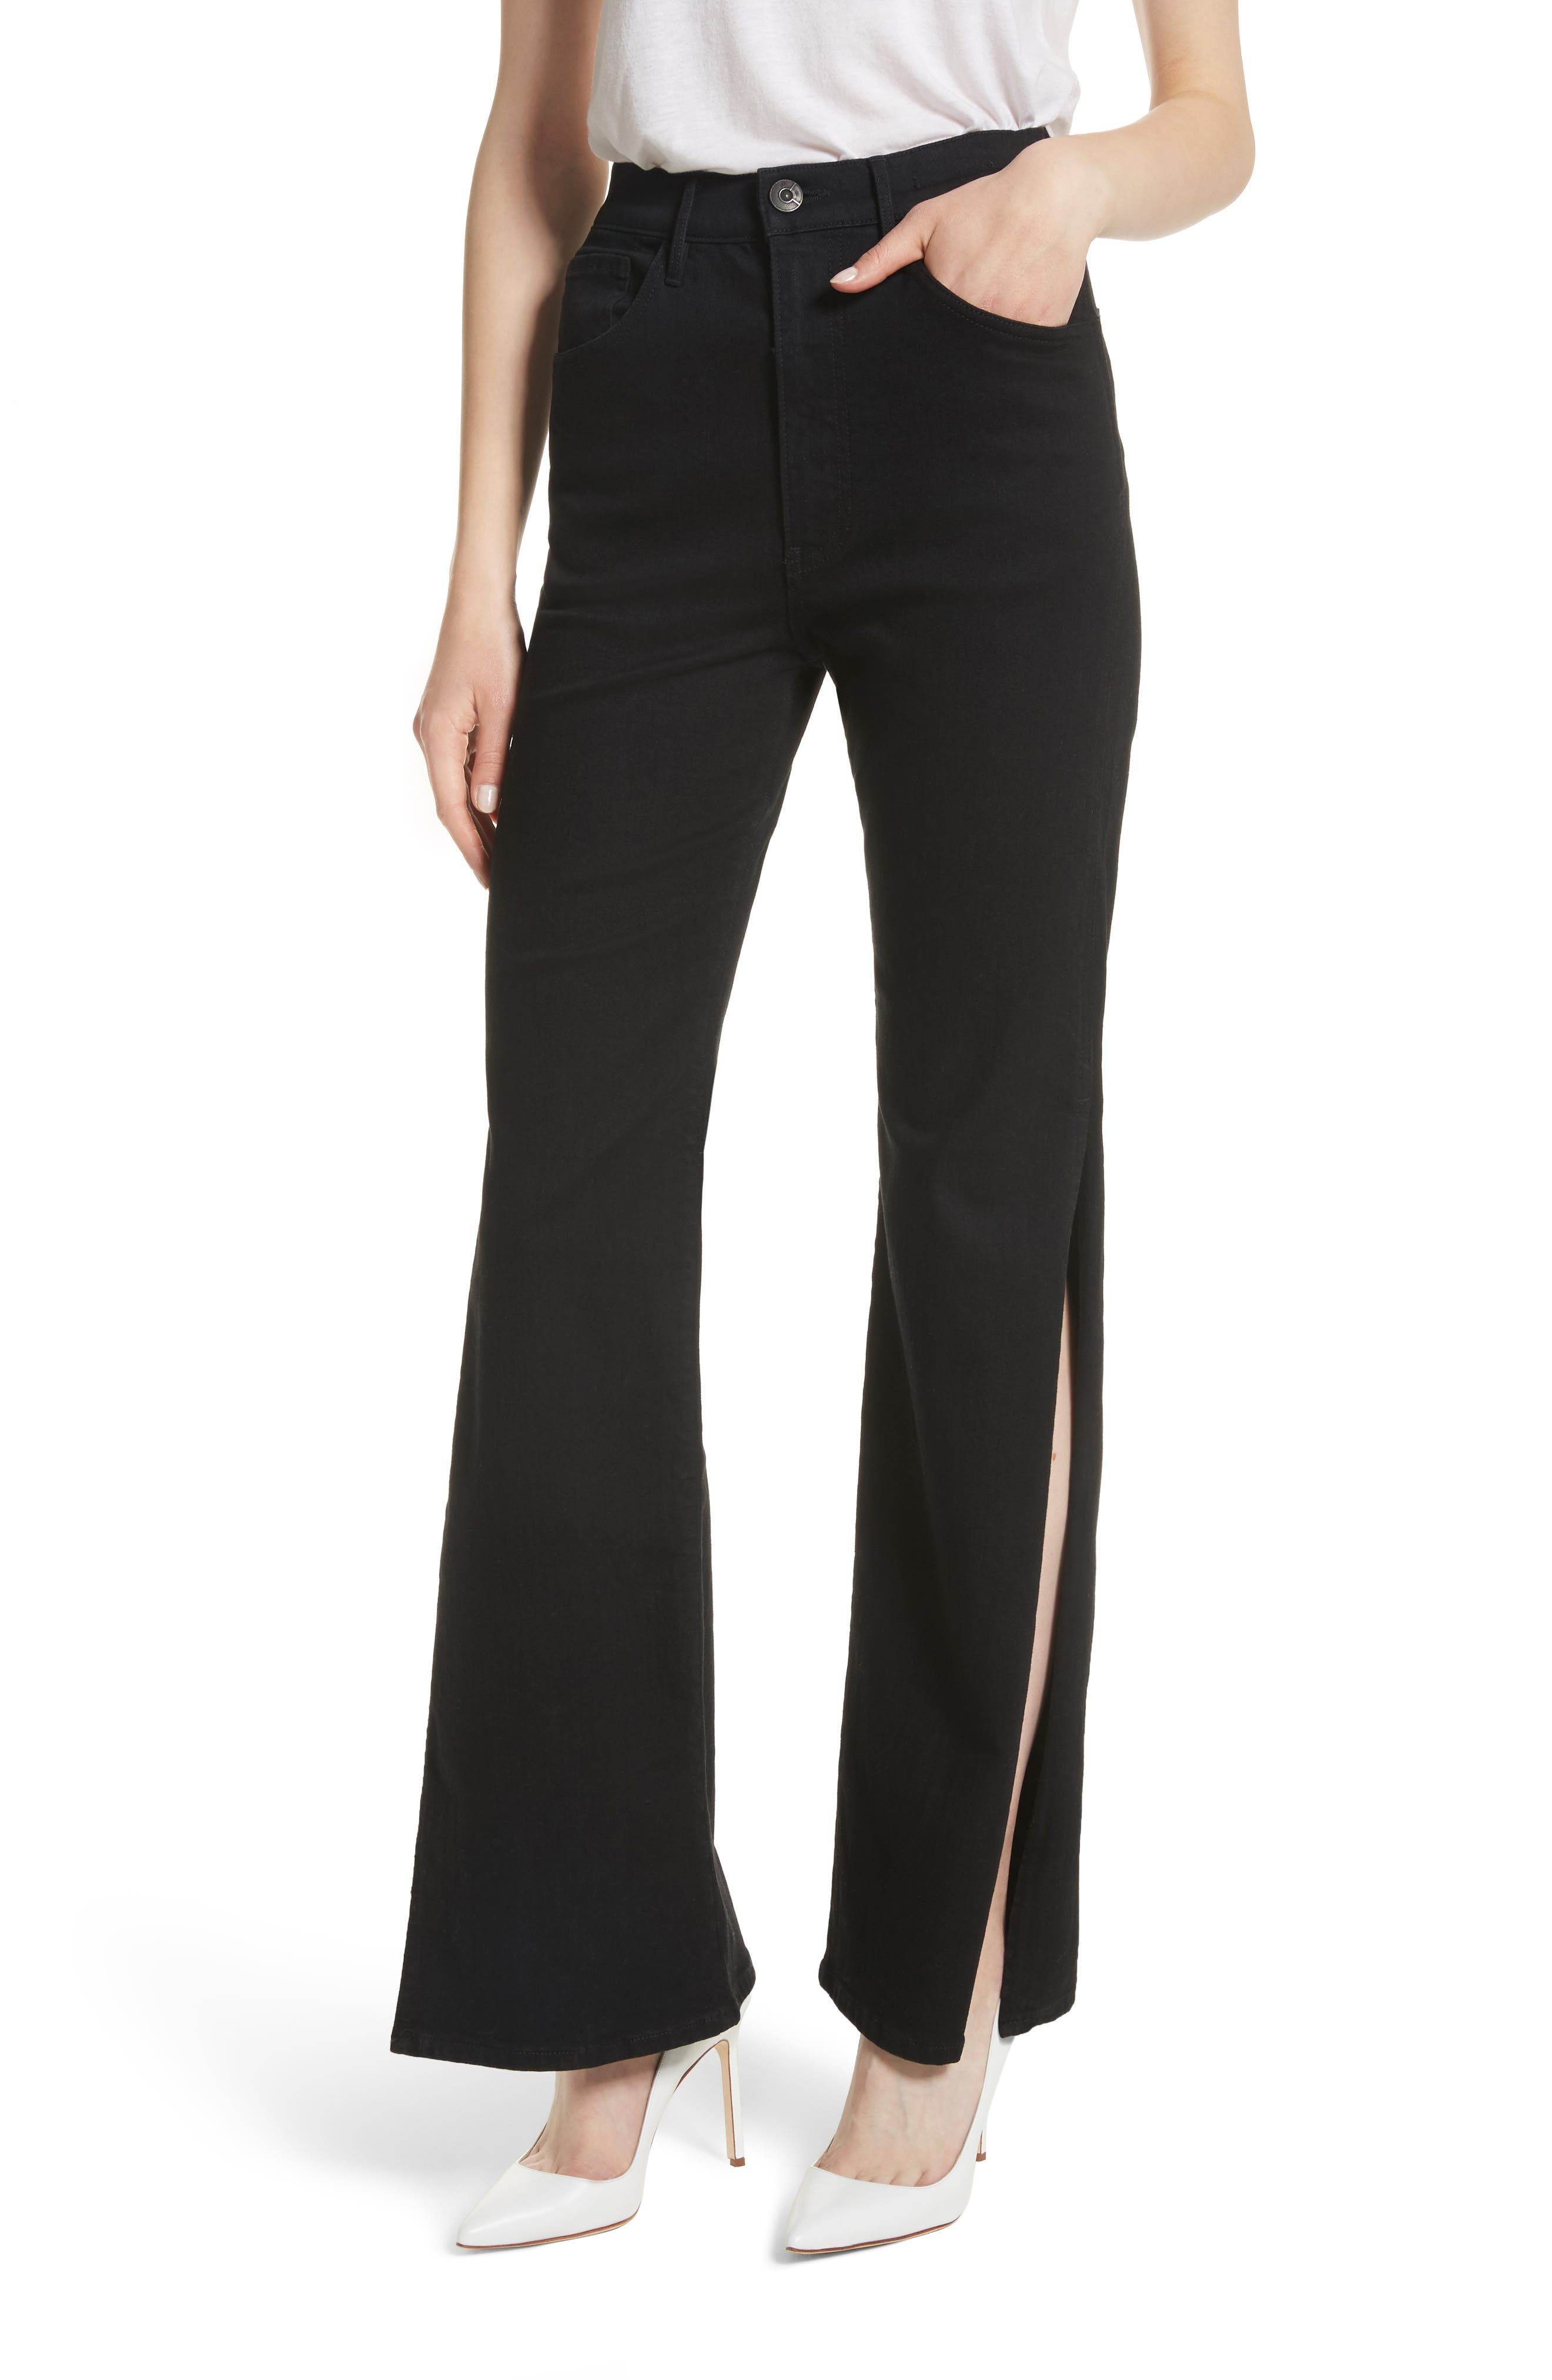 W4 Adeline High Waist Split Flare Jeans,                         Main,                         color, Black No 1